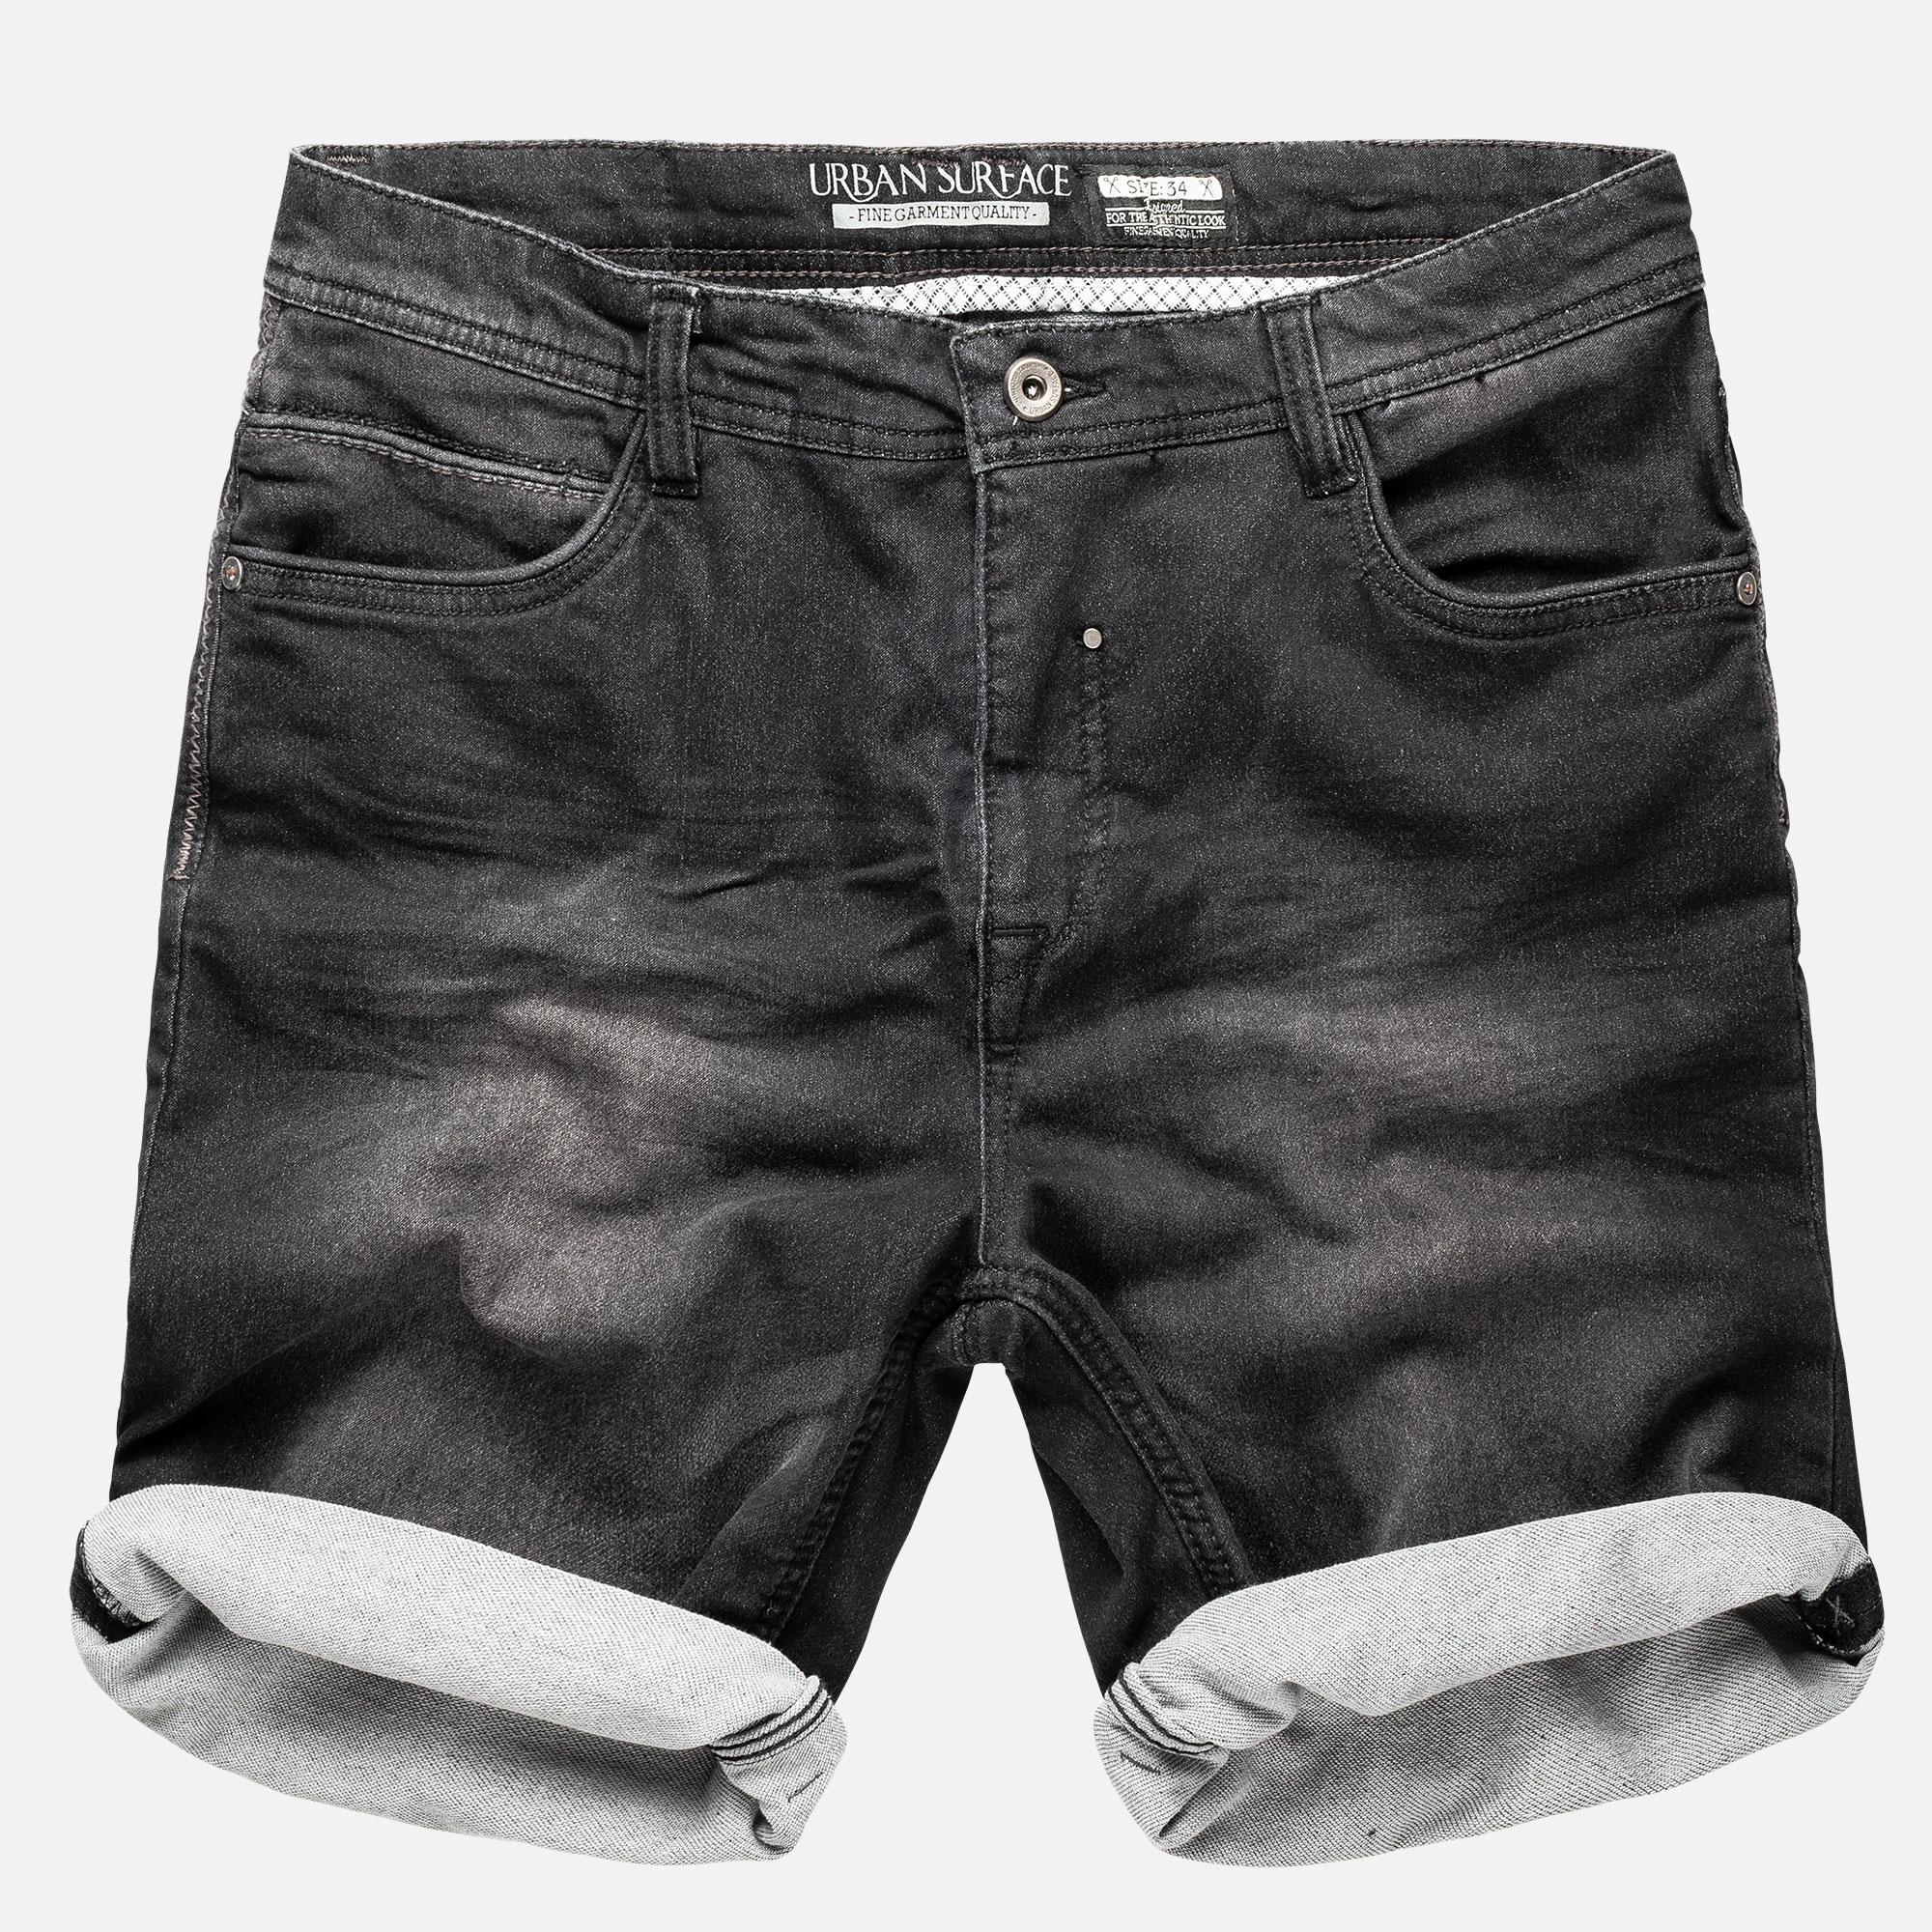 URBAN SURFACE Sweat Jeans Shorts Herren kurze Hose Short Denim Bermuda Sublevel